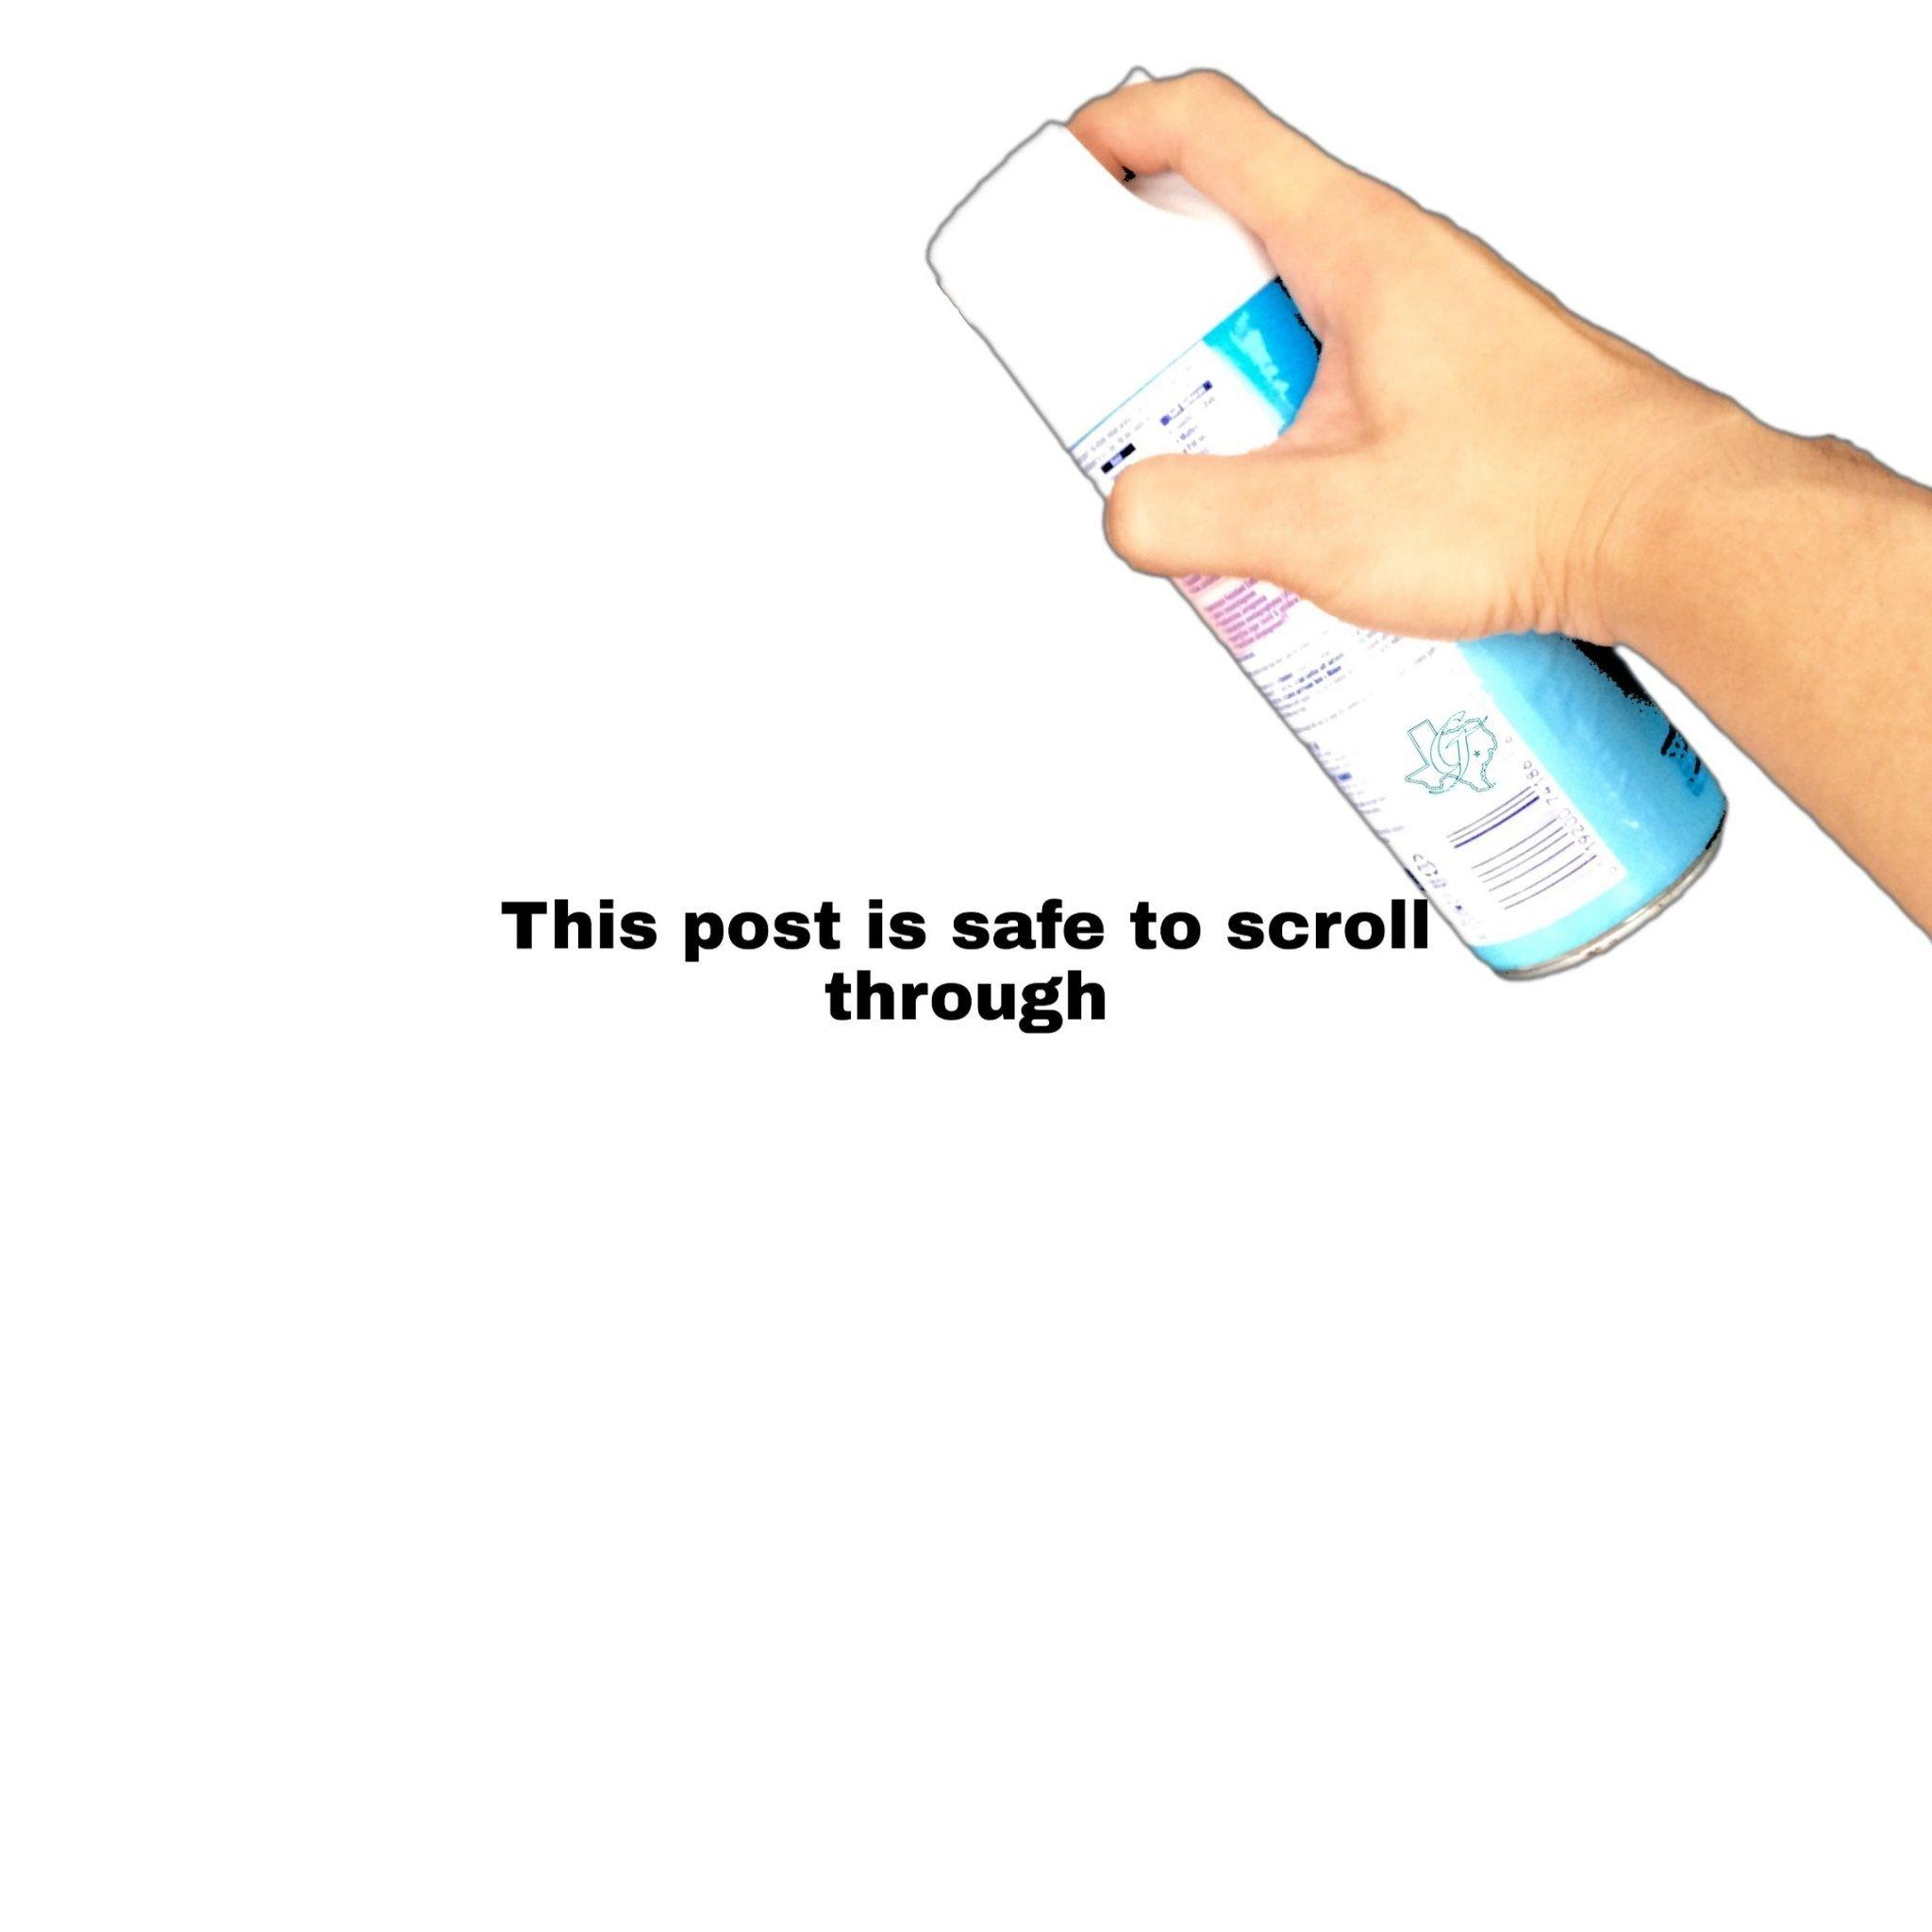 Safety 1st! - meme